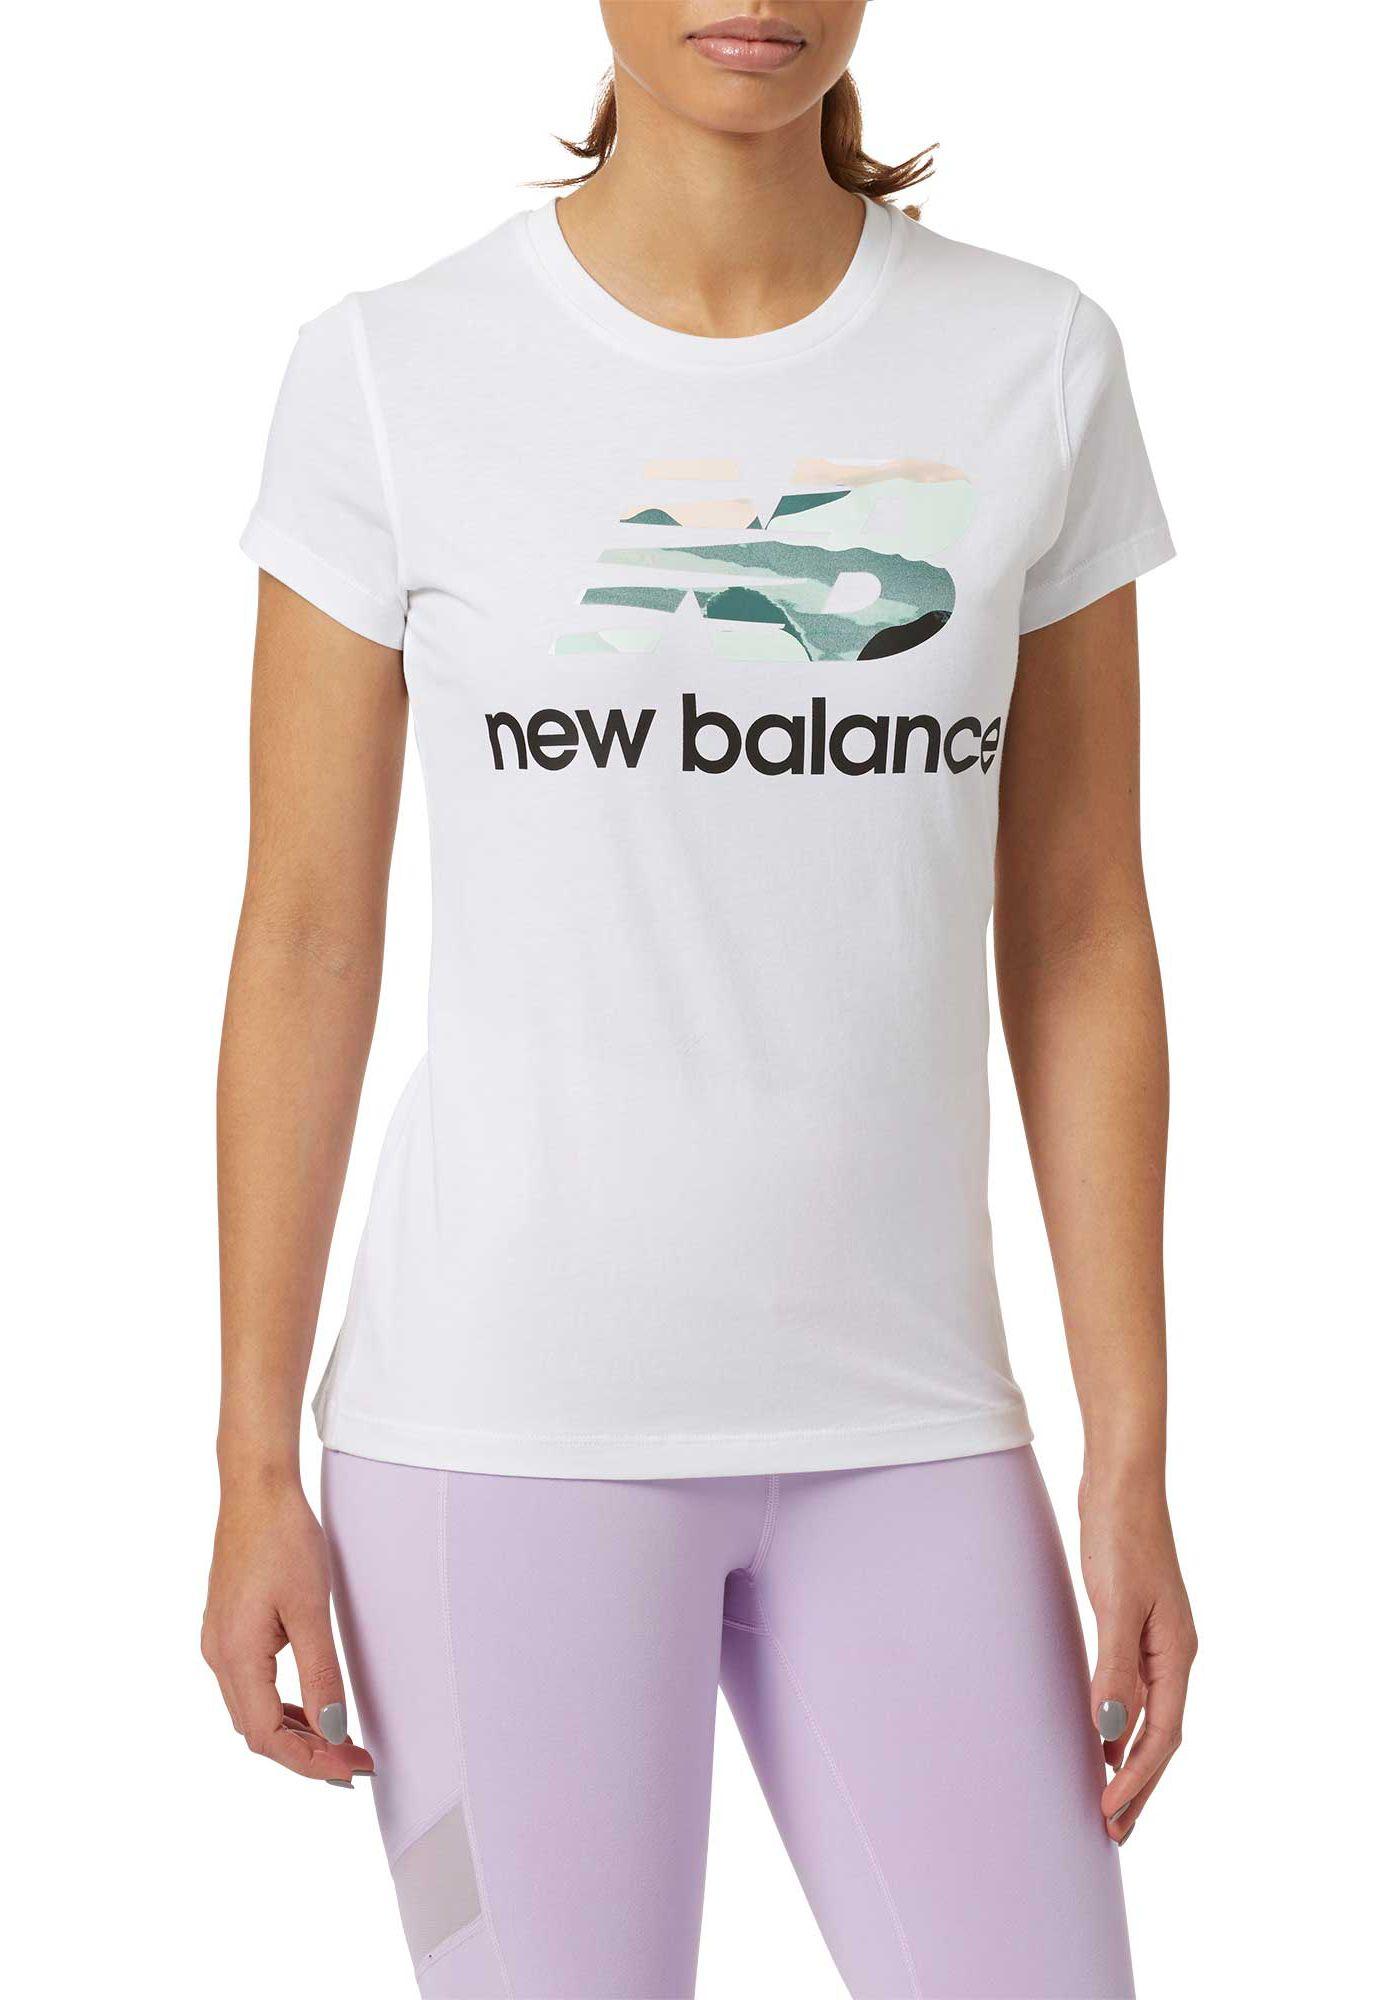 New Balance Women's Essentials Aqua Camo T-Shirt